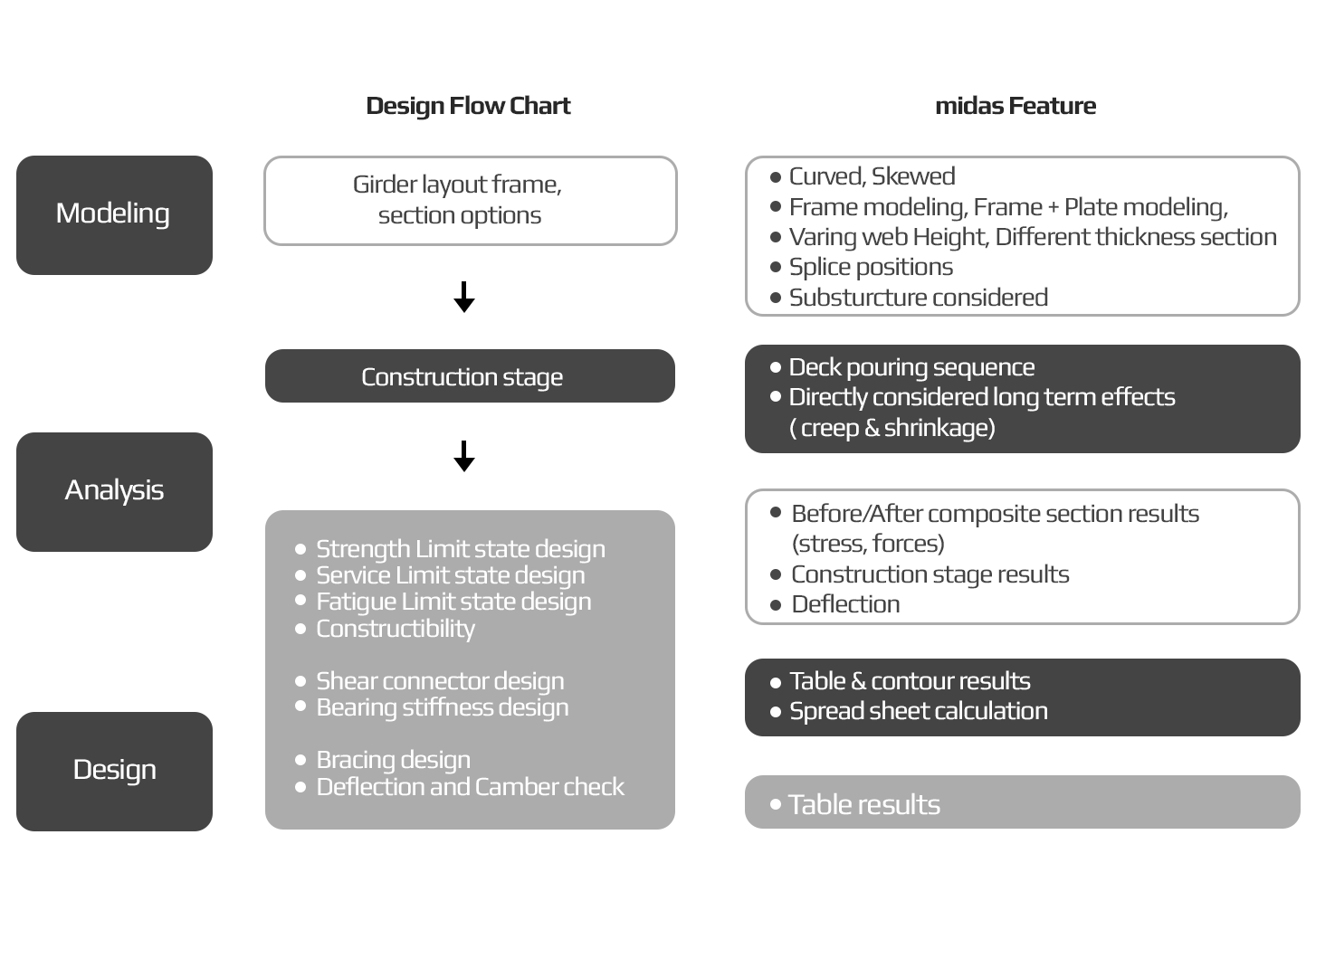 Staged Analysis for Steel Bridges